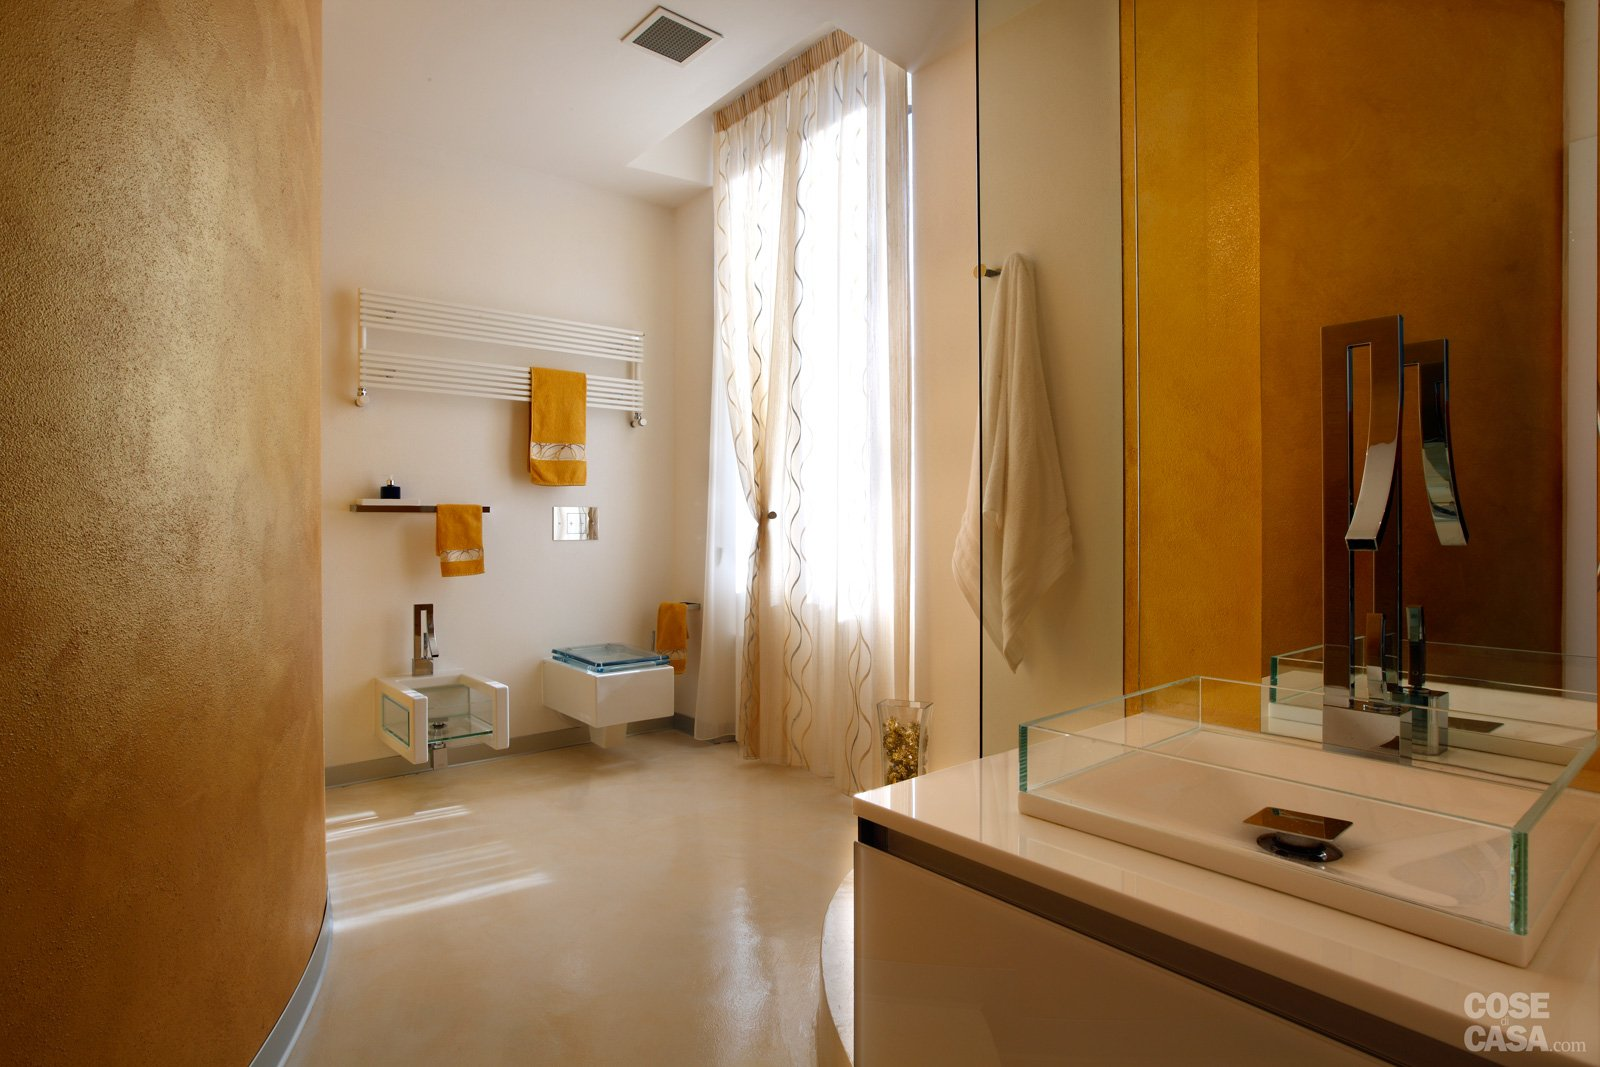 Pareti Divisorie Mobili Per Casa : Pareti mobili casa with pareti mobili casa pareti mobili per